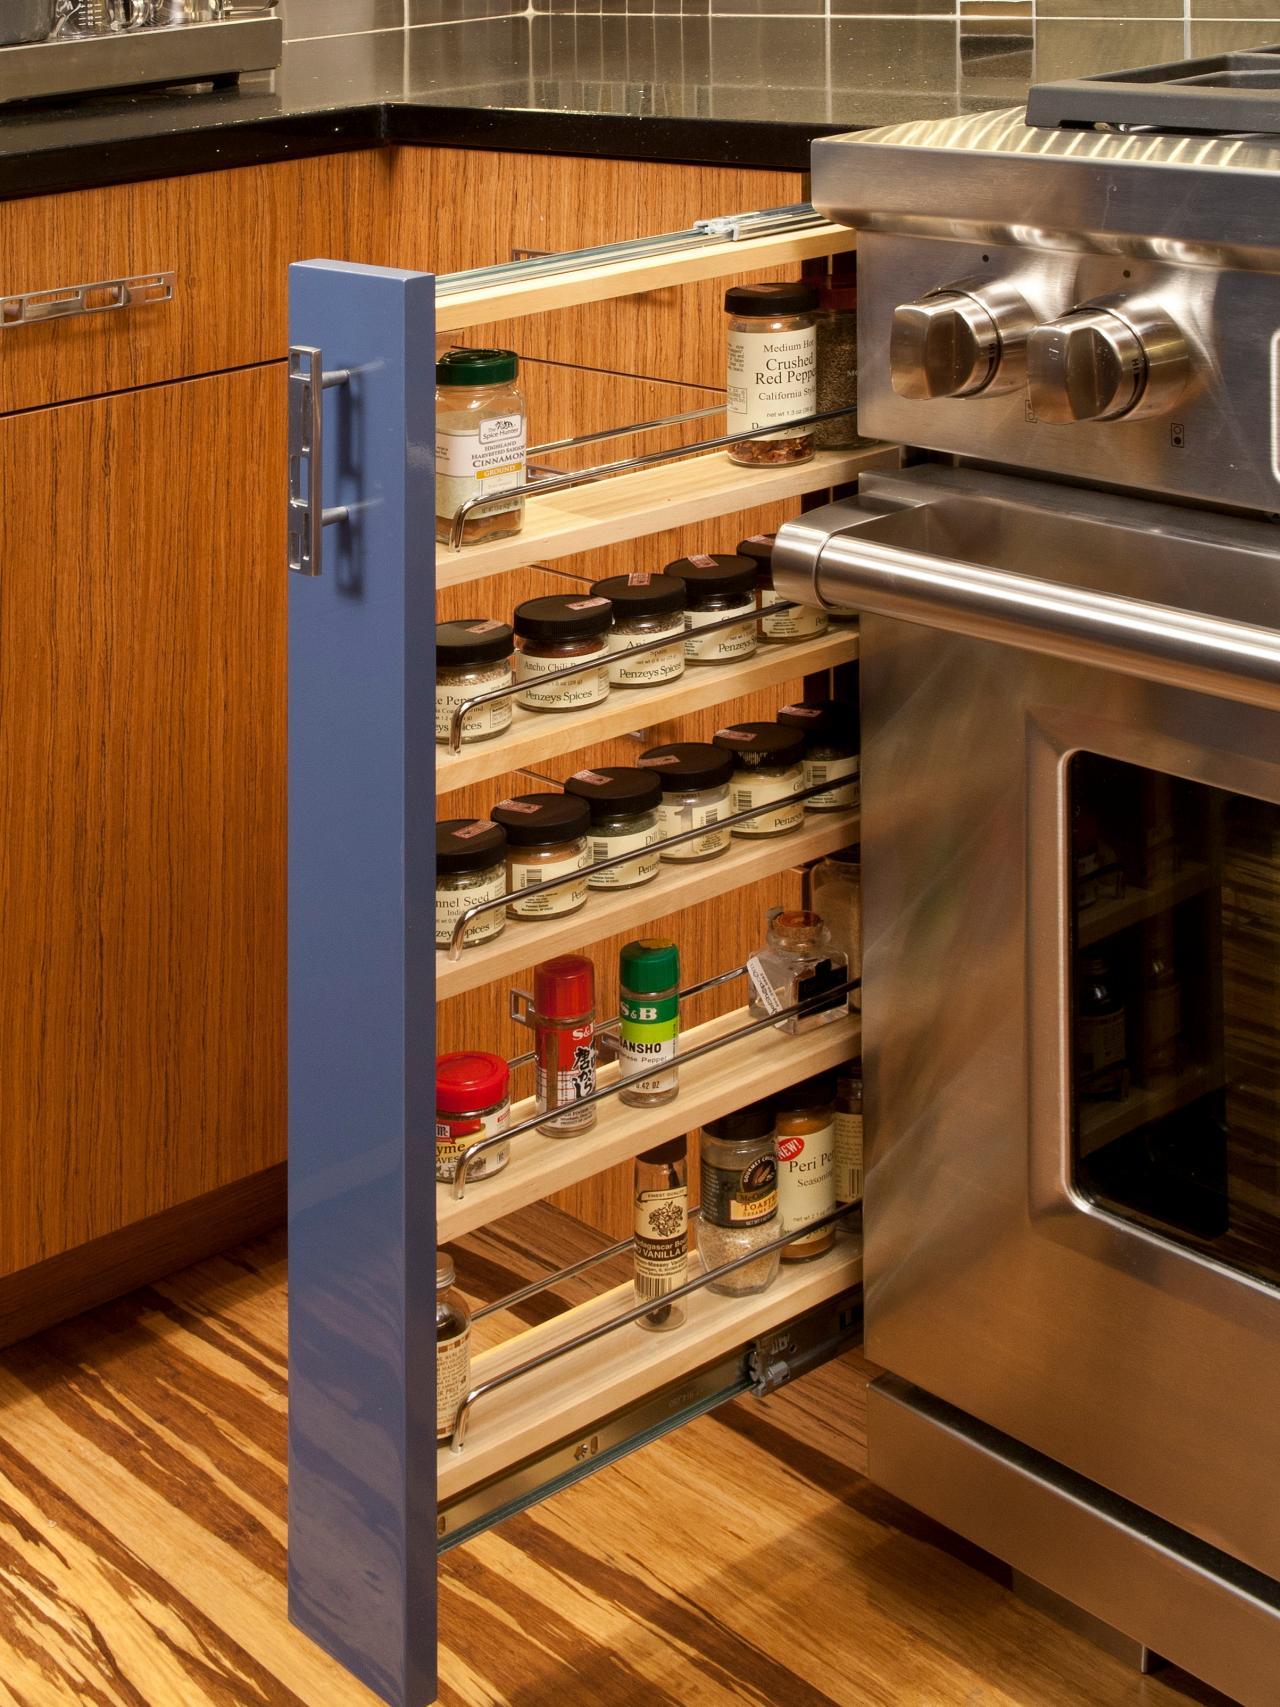 Sleek Modern Kitchen With Slide-out Spice Rack